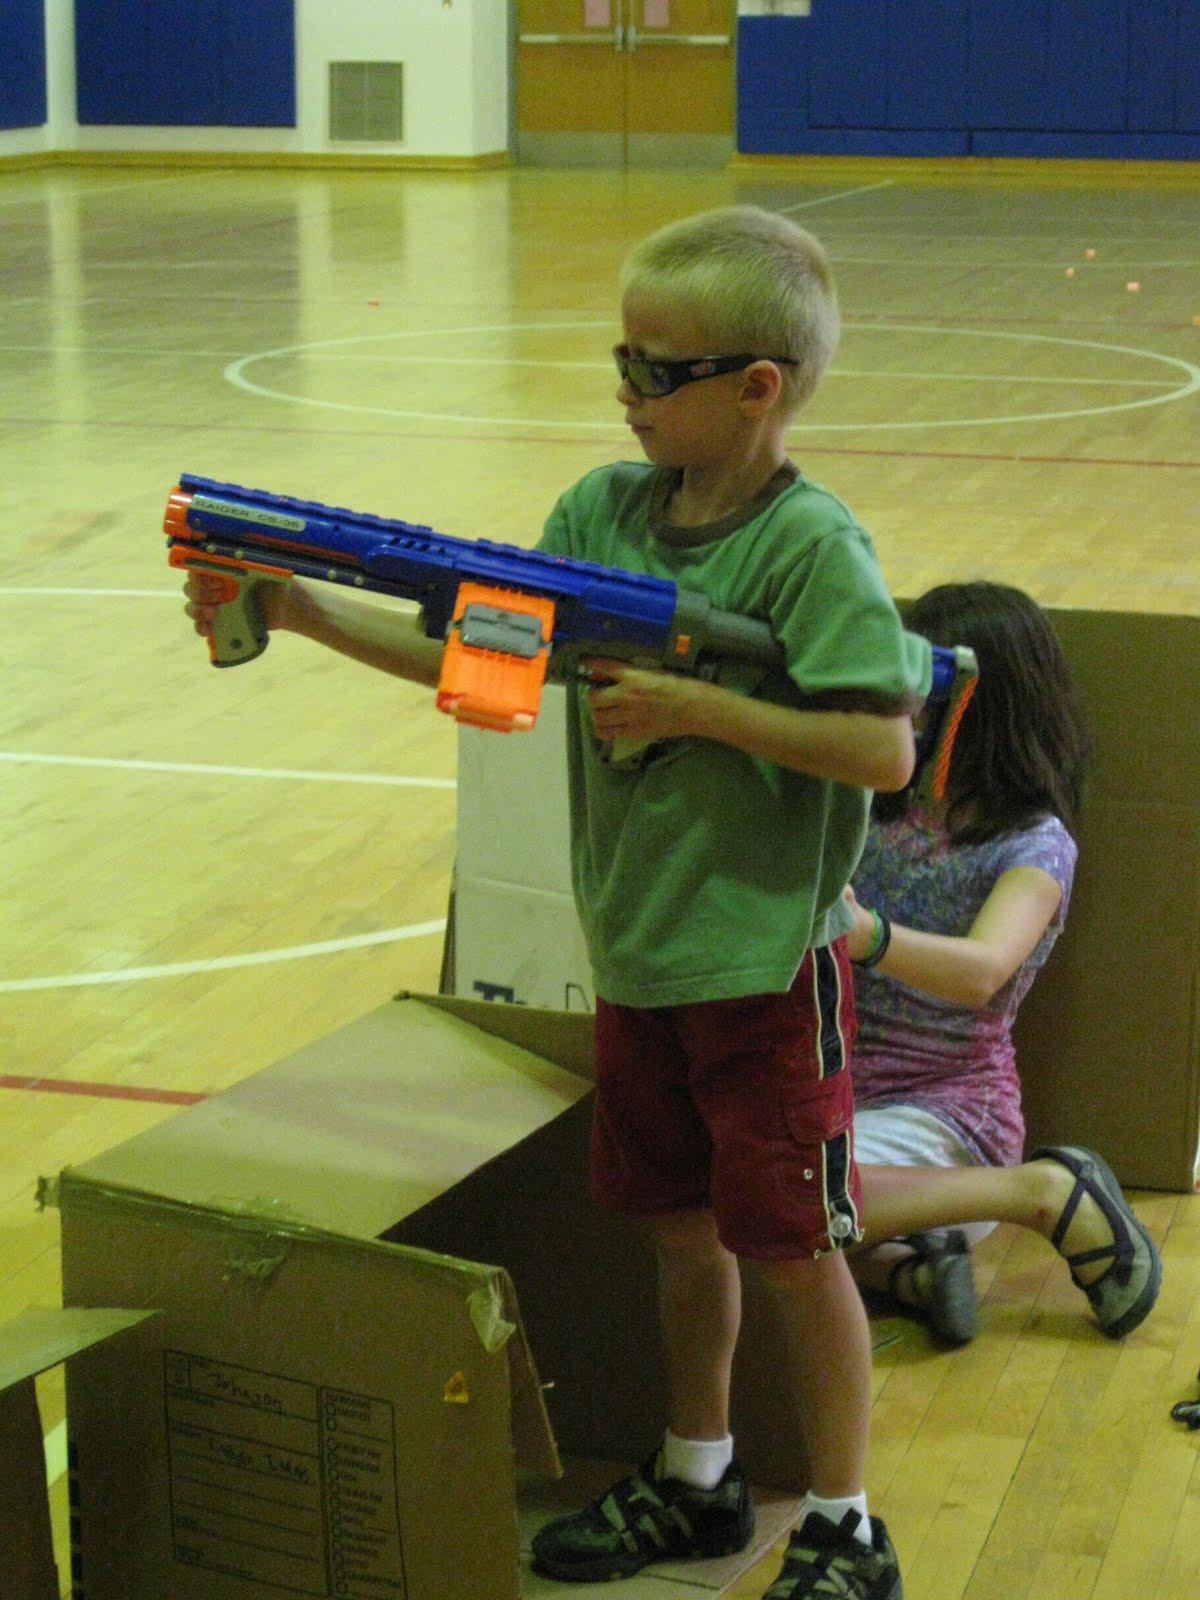 The Offner Adventures Nerf Gun Games